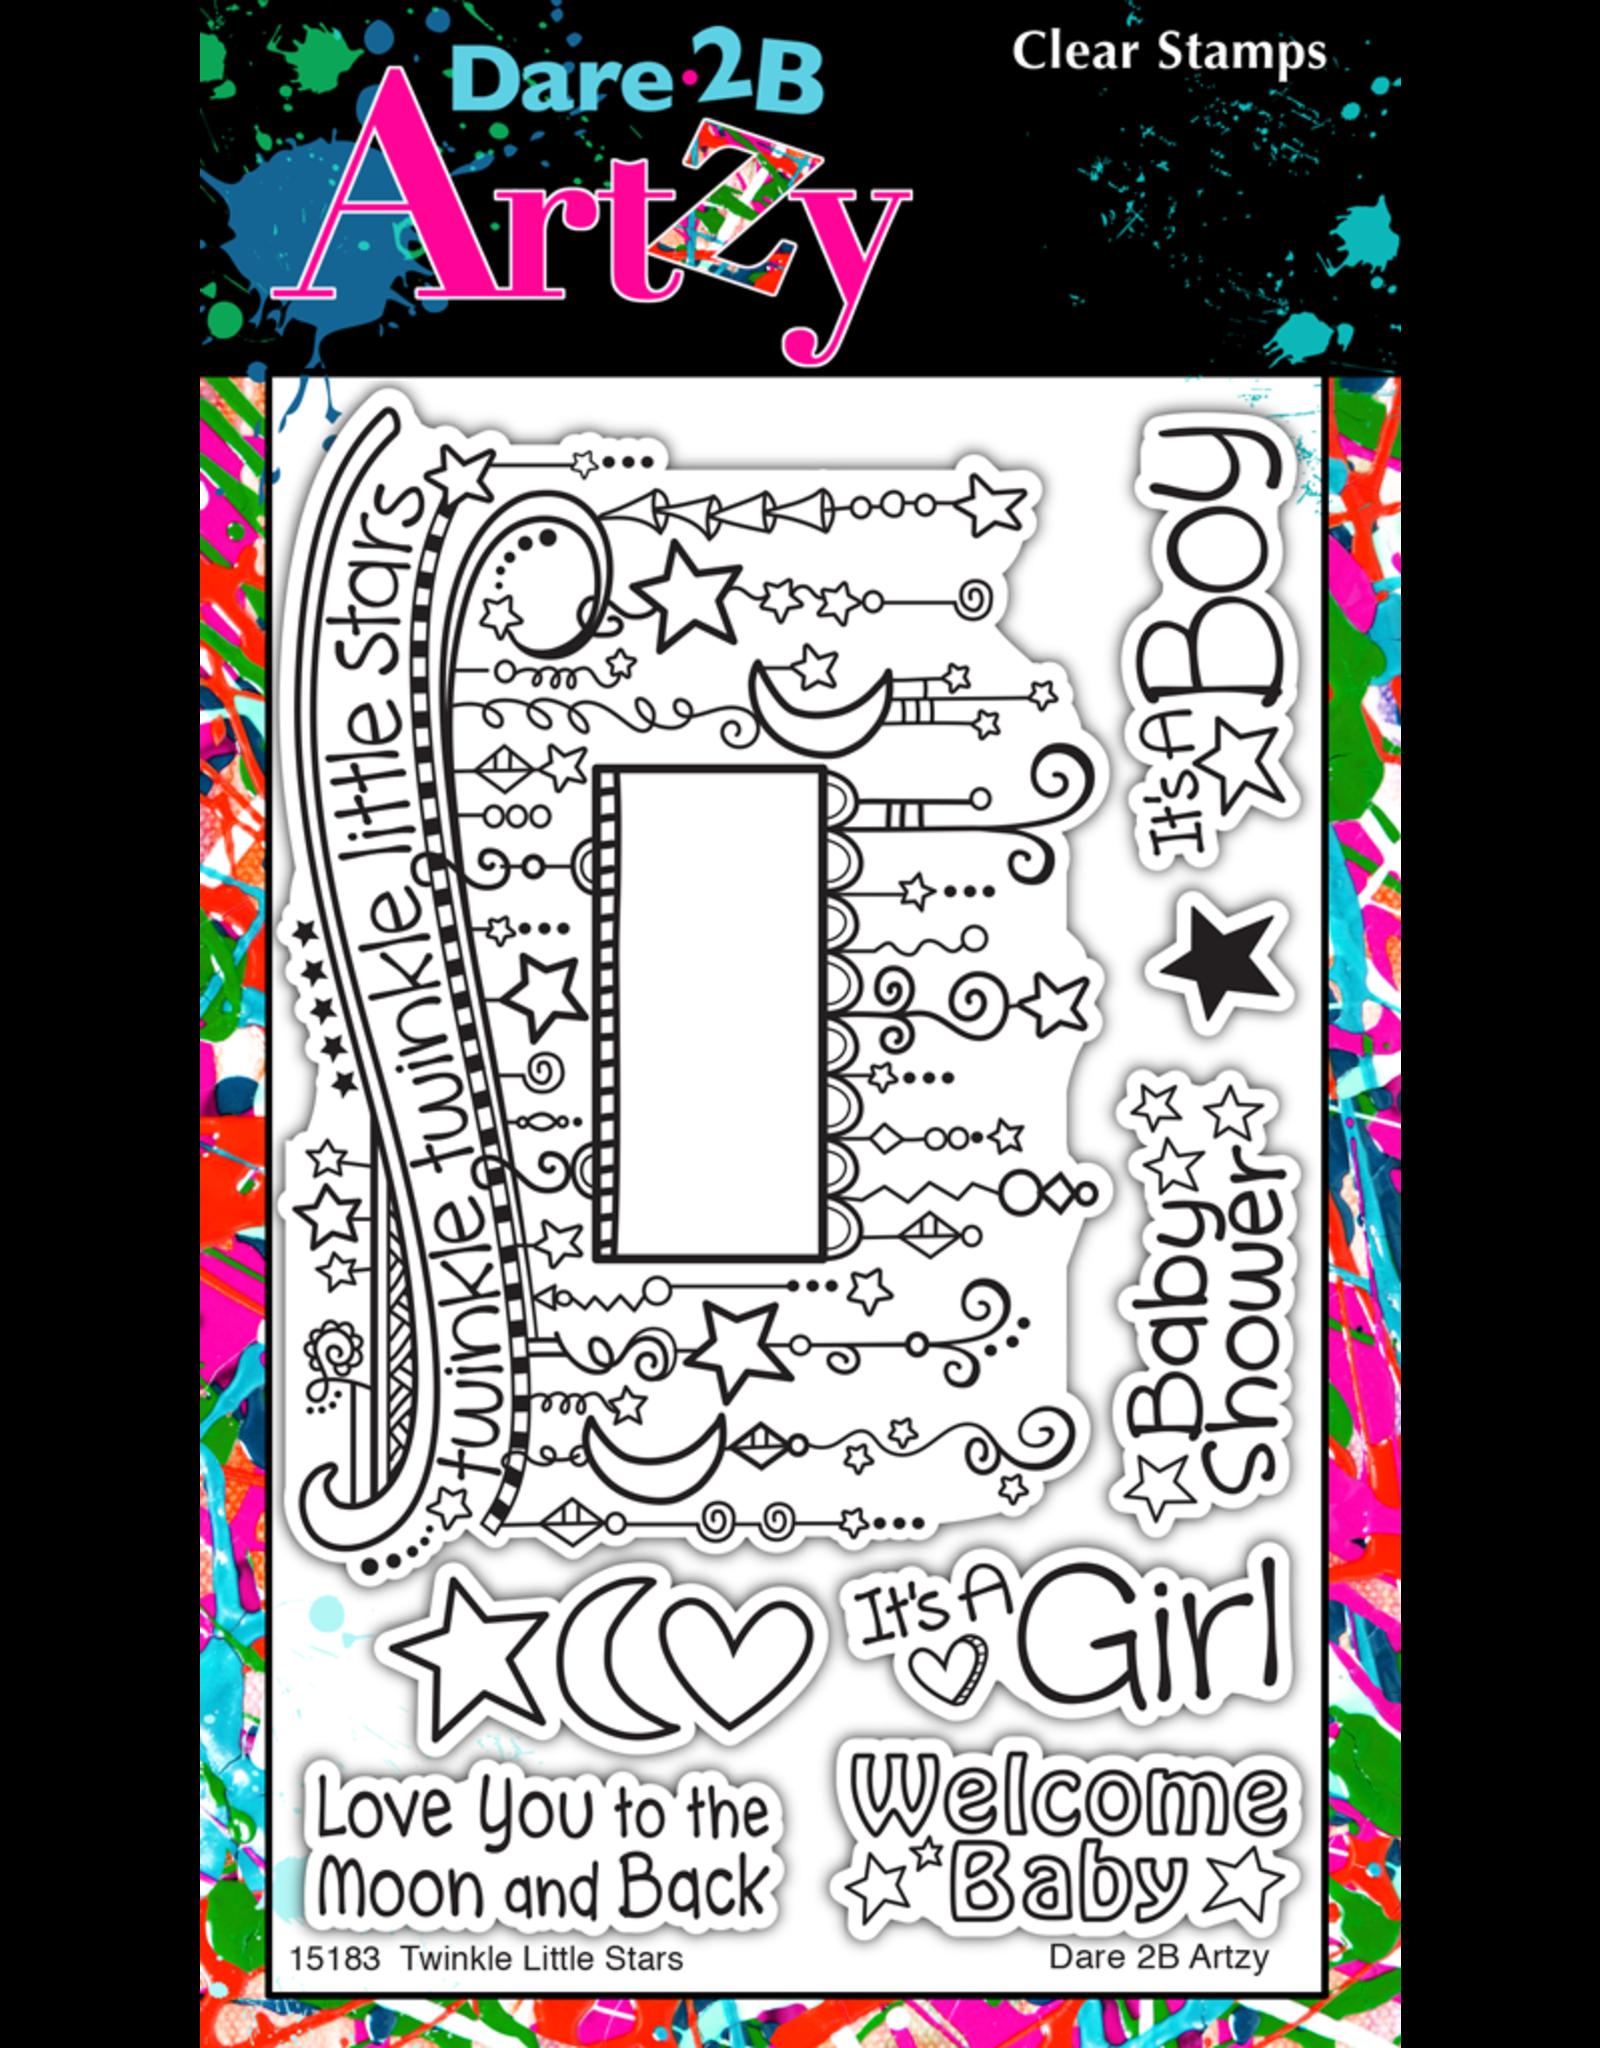 Dare 2B Artzy Twinkle Lil Star - Clear Stamp Set